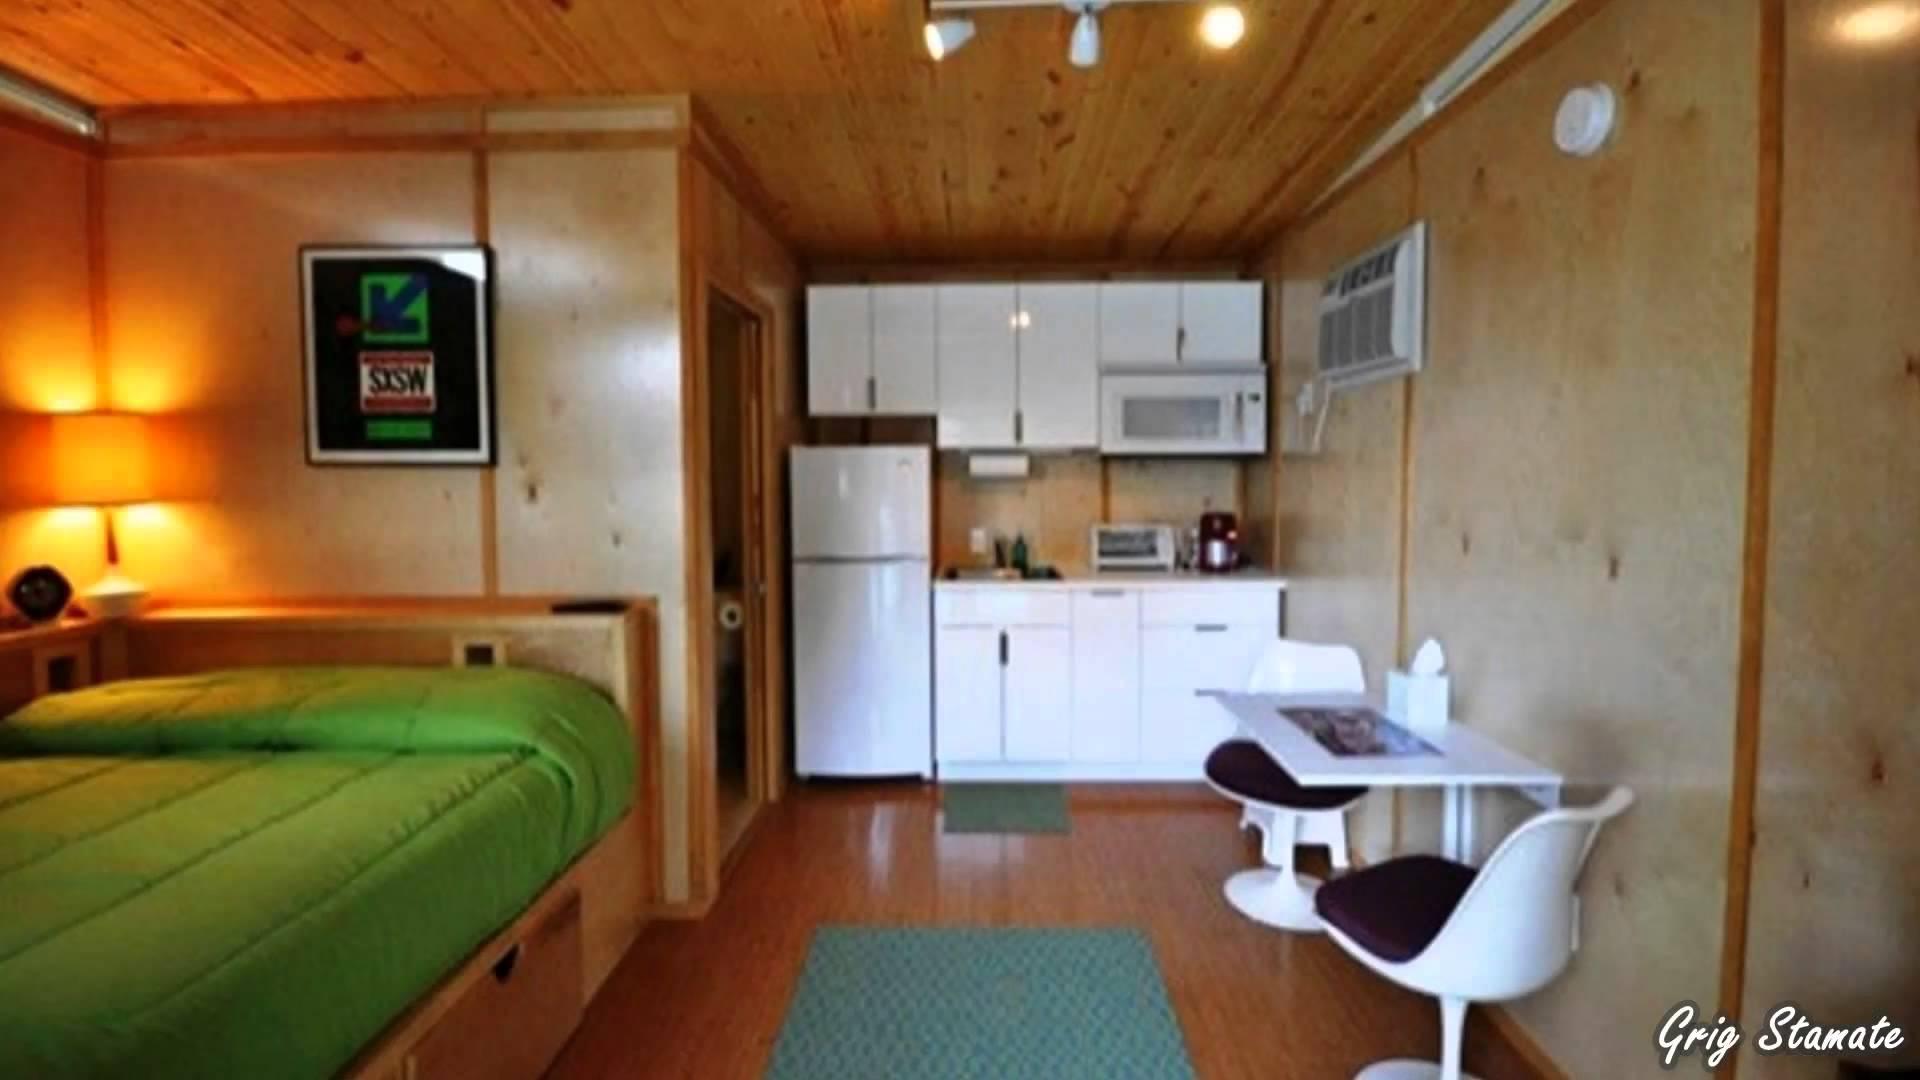 small house interior design small and tiny house interior design ideas - youtube WDYJIFJ